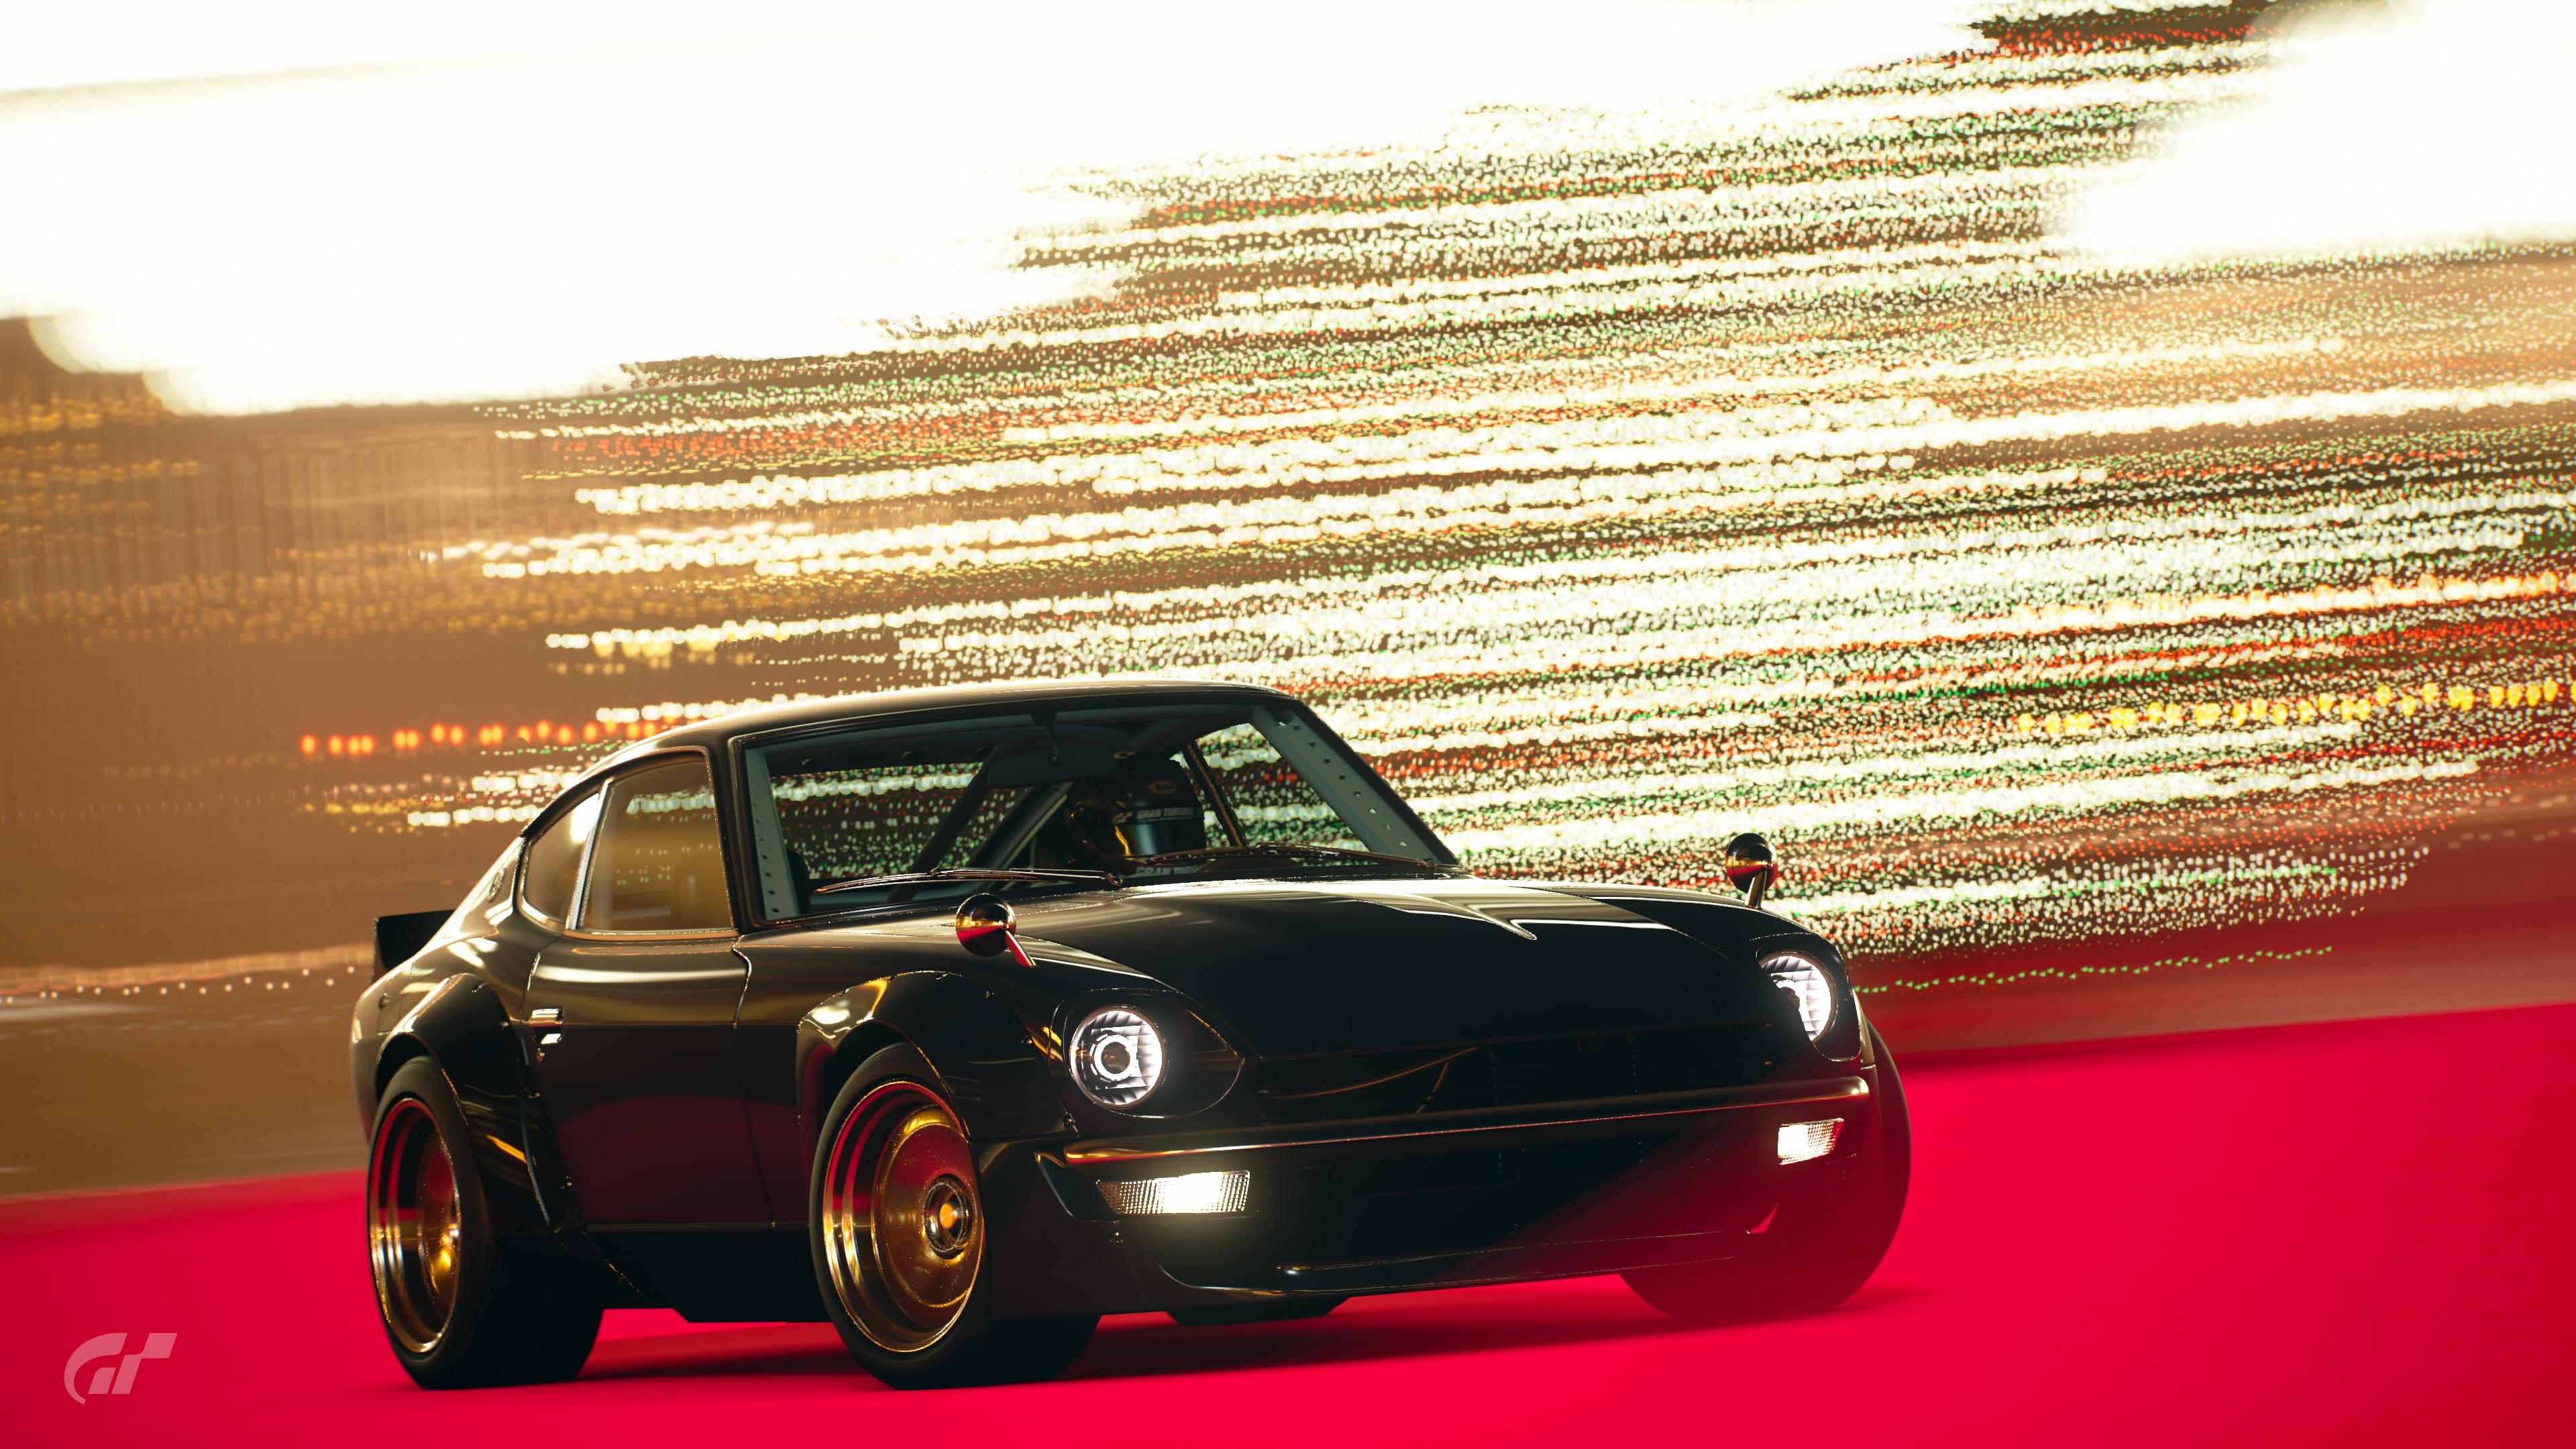 mazda 4k 1547938533 - Mazda 4k - mazda wallpapers, hd-wallpapers, games wallpapers, cars wallpapers, 4k-wallpapers